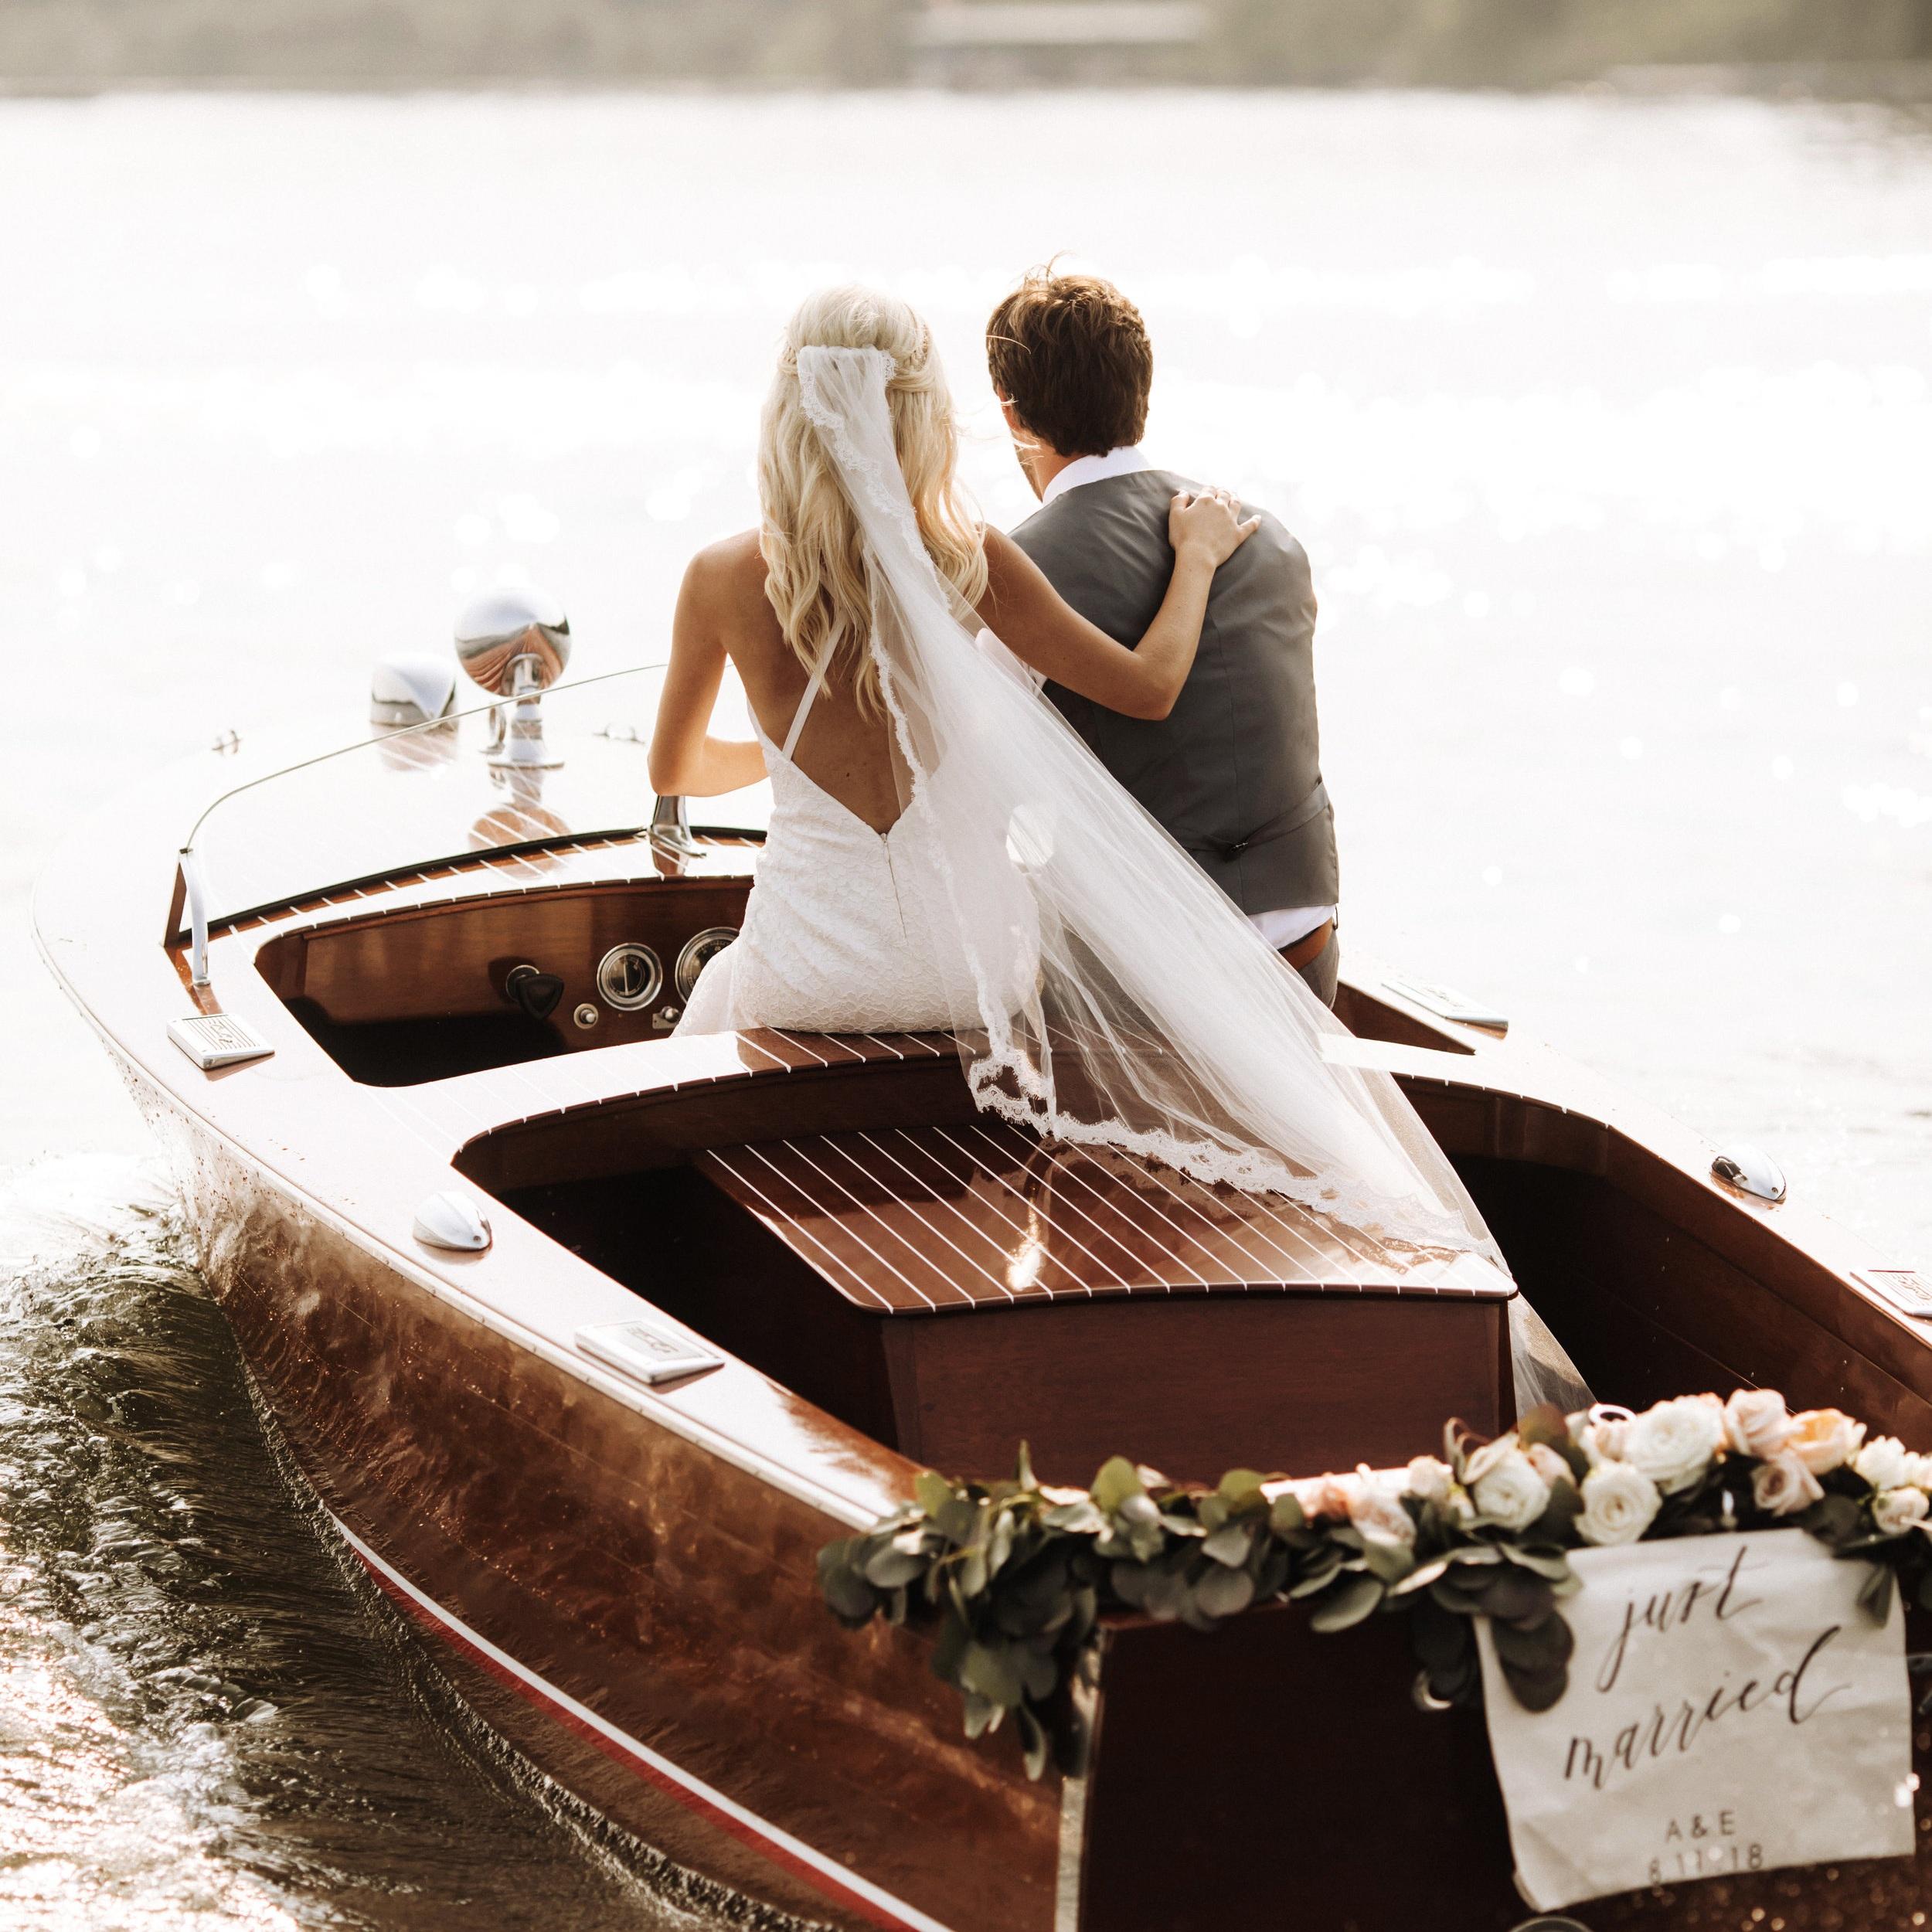 Alex%2BEvan+Brainerd+Wedding+Planner+Bloom+Designs.jpg